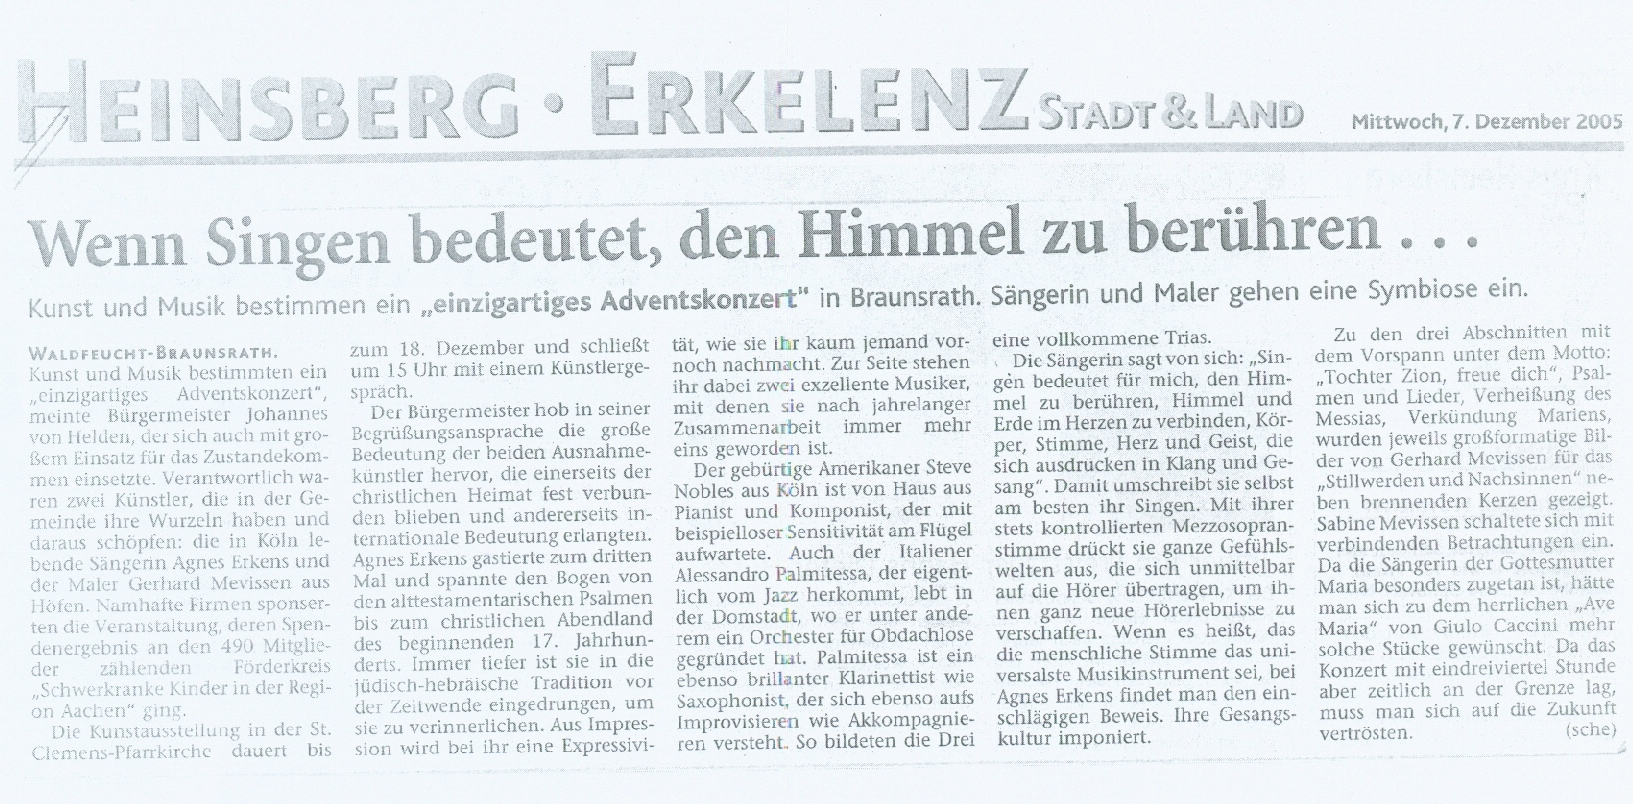 Wenn_Singen_bedeutet_den_Himmel_zu_beruhren-Zeitungsbericht